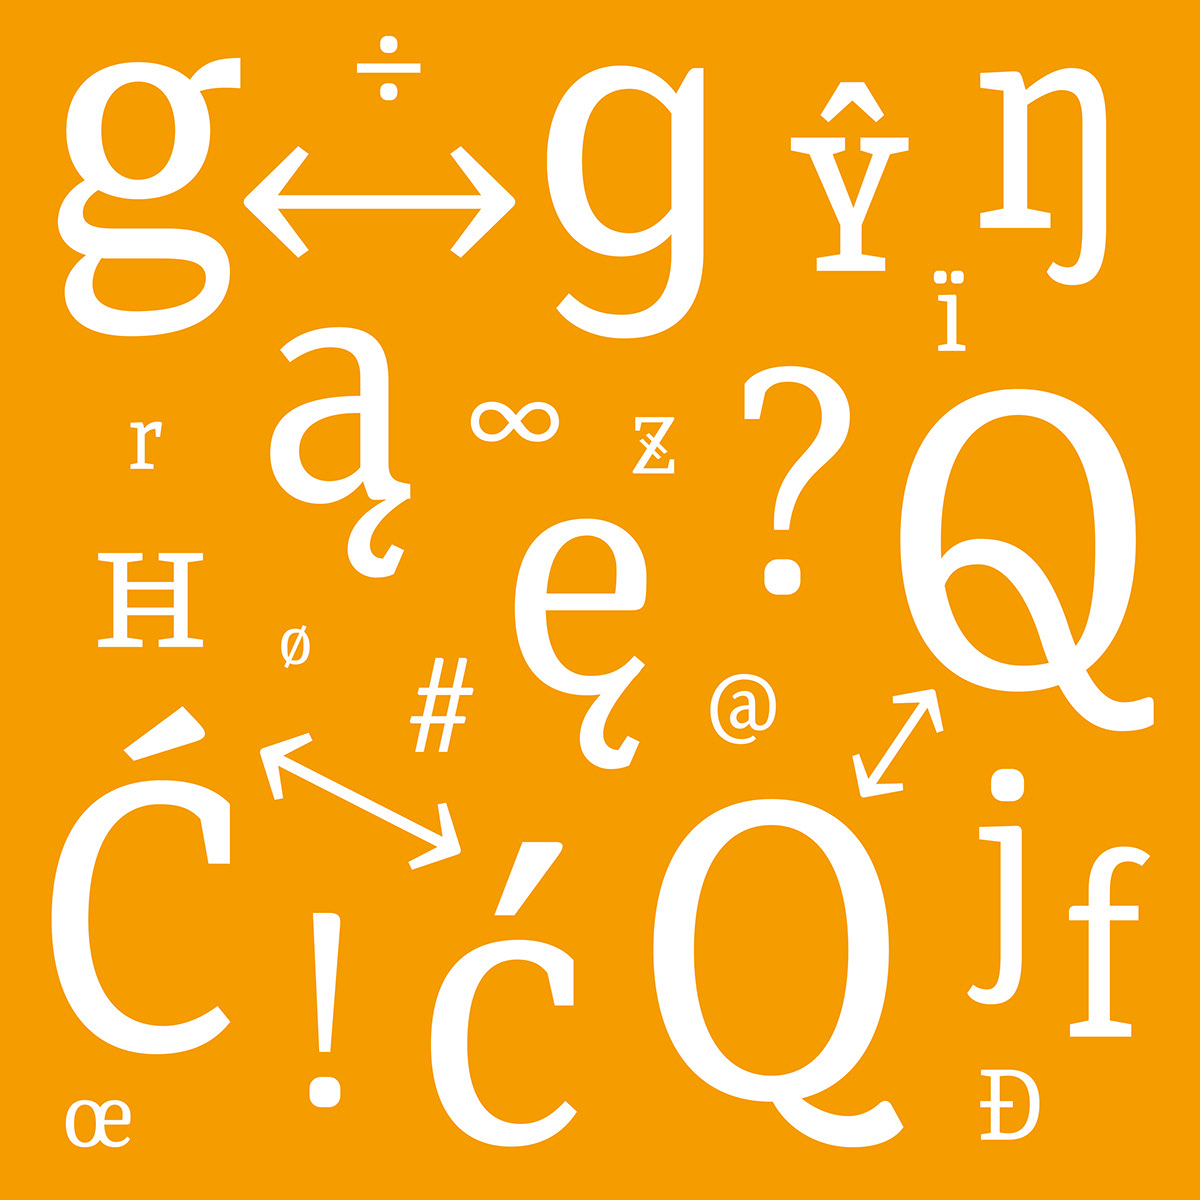 font fony design glyphs Krój Pisma magazine newspaper Typeface typeface design typografia typography